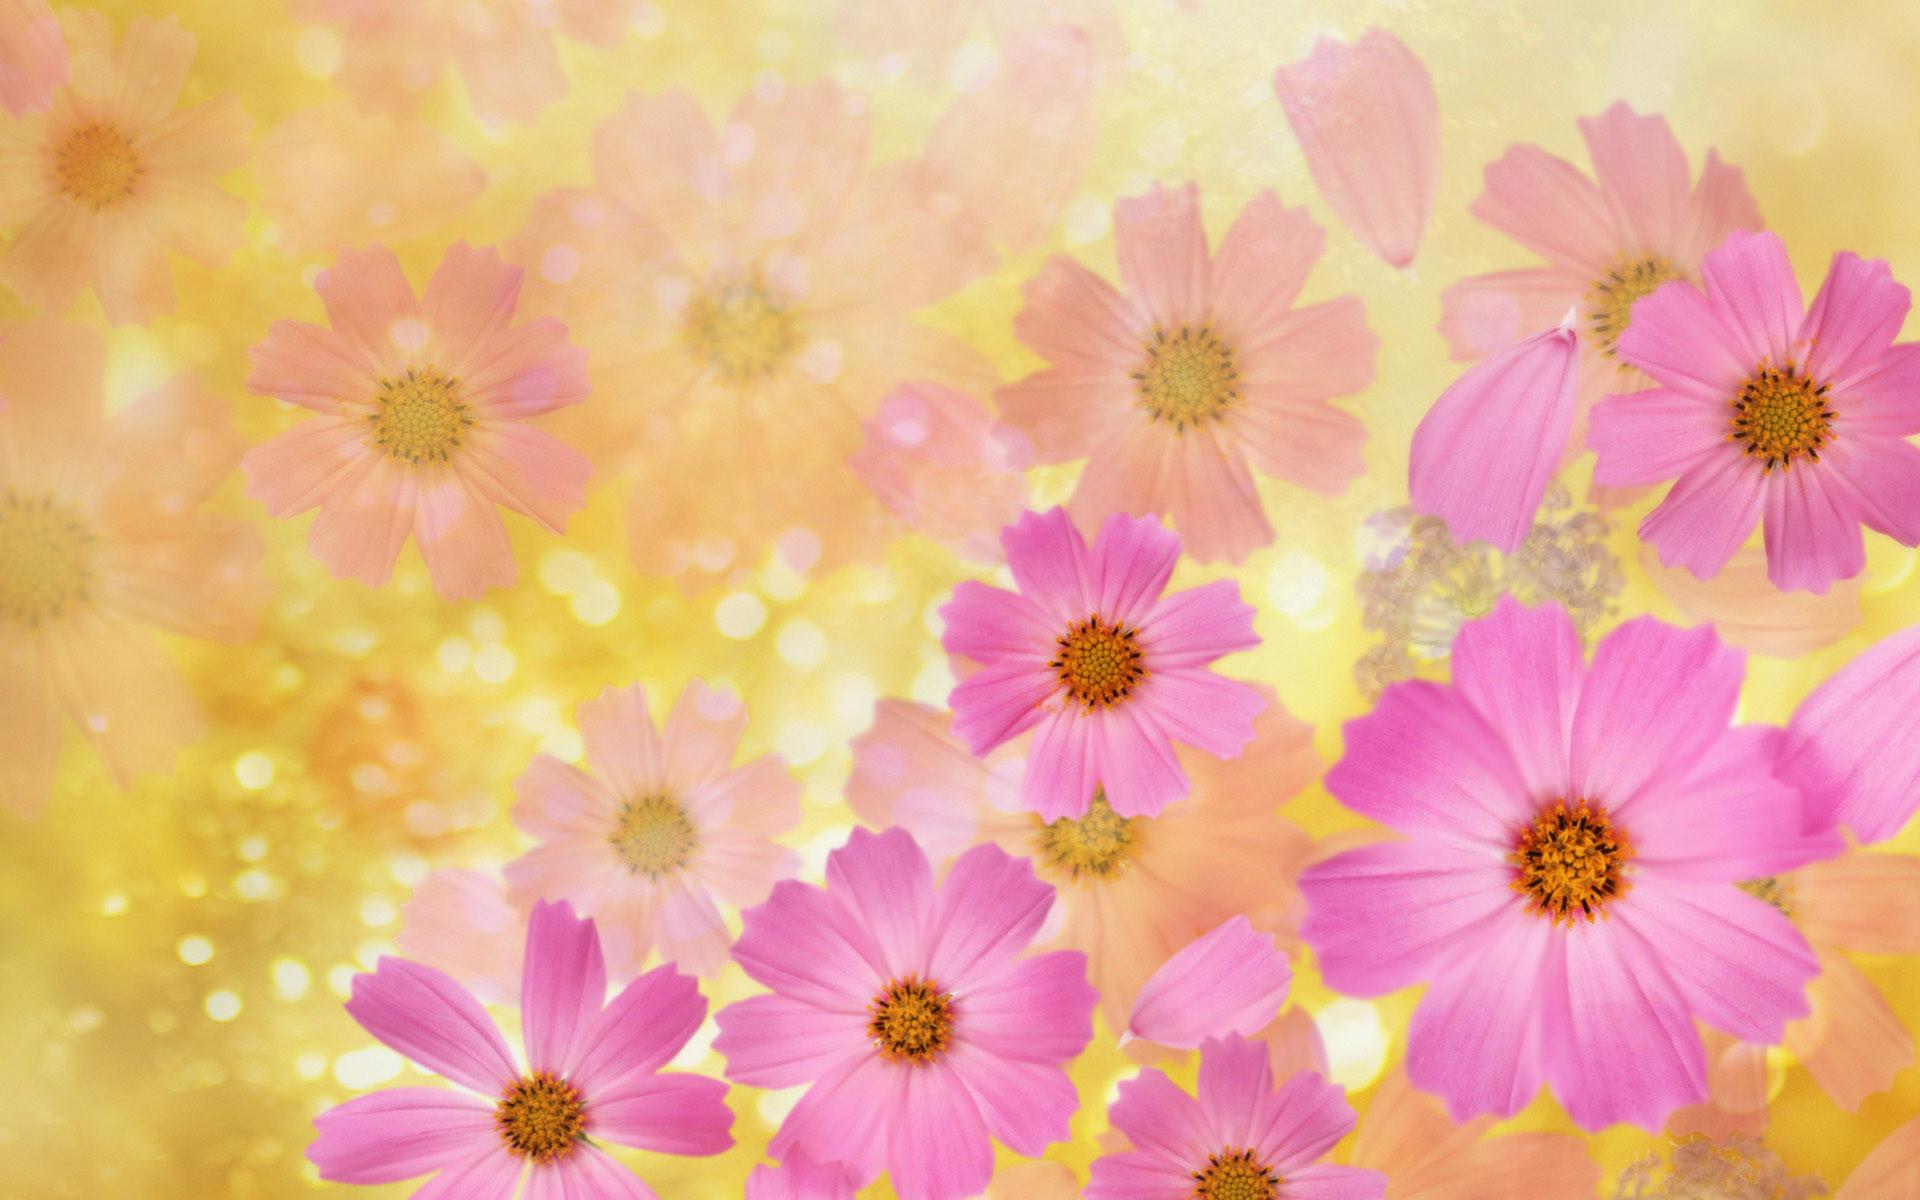 May flowers wallpaper hd desktop 66 images - Flower wallpaper hd quality ...